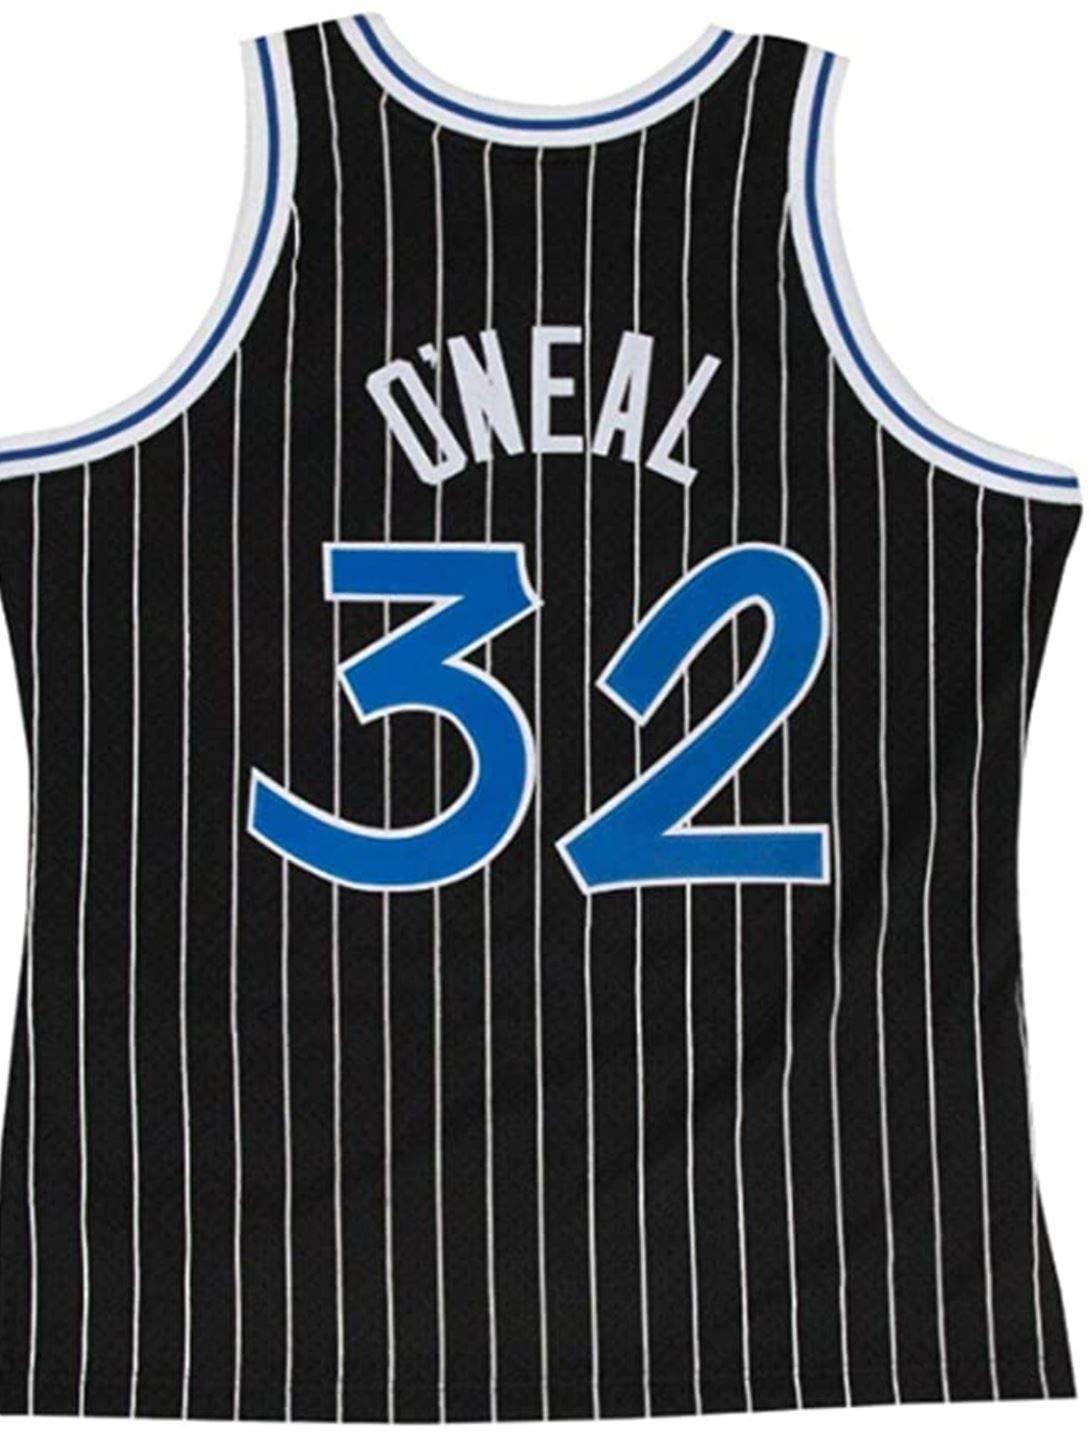 Mitchell & Ness Orlando Magic Shaquille O'Neal 1994 Alternate Swingman Jersey